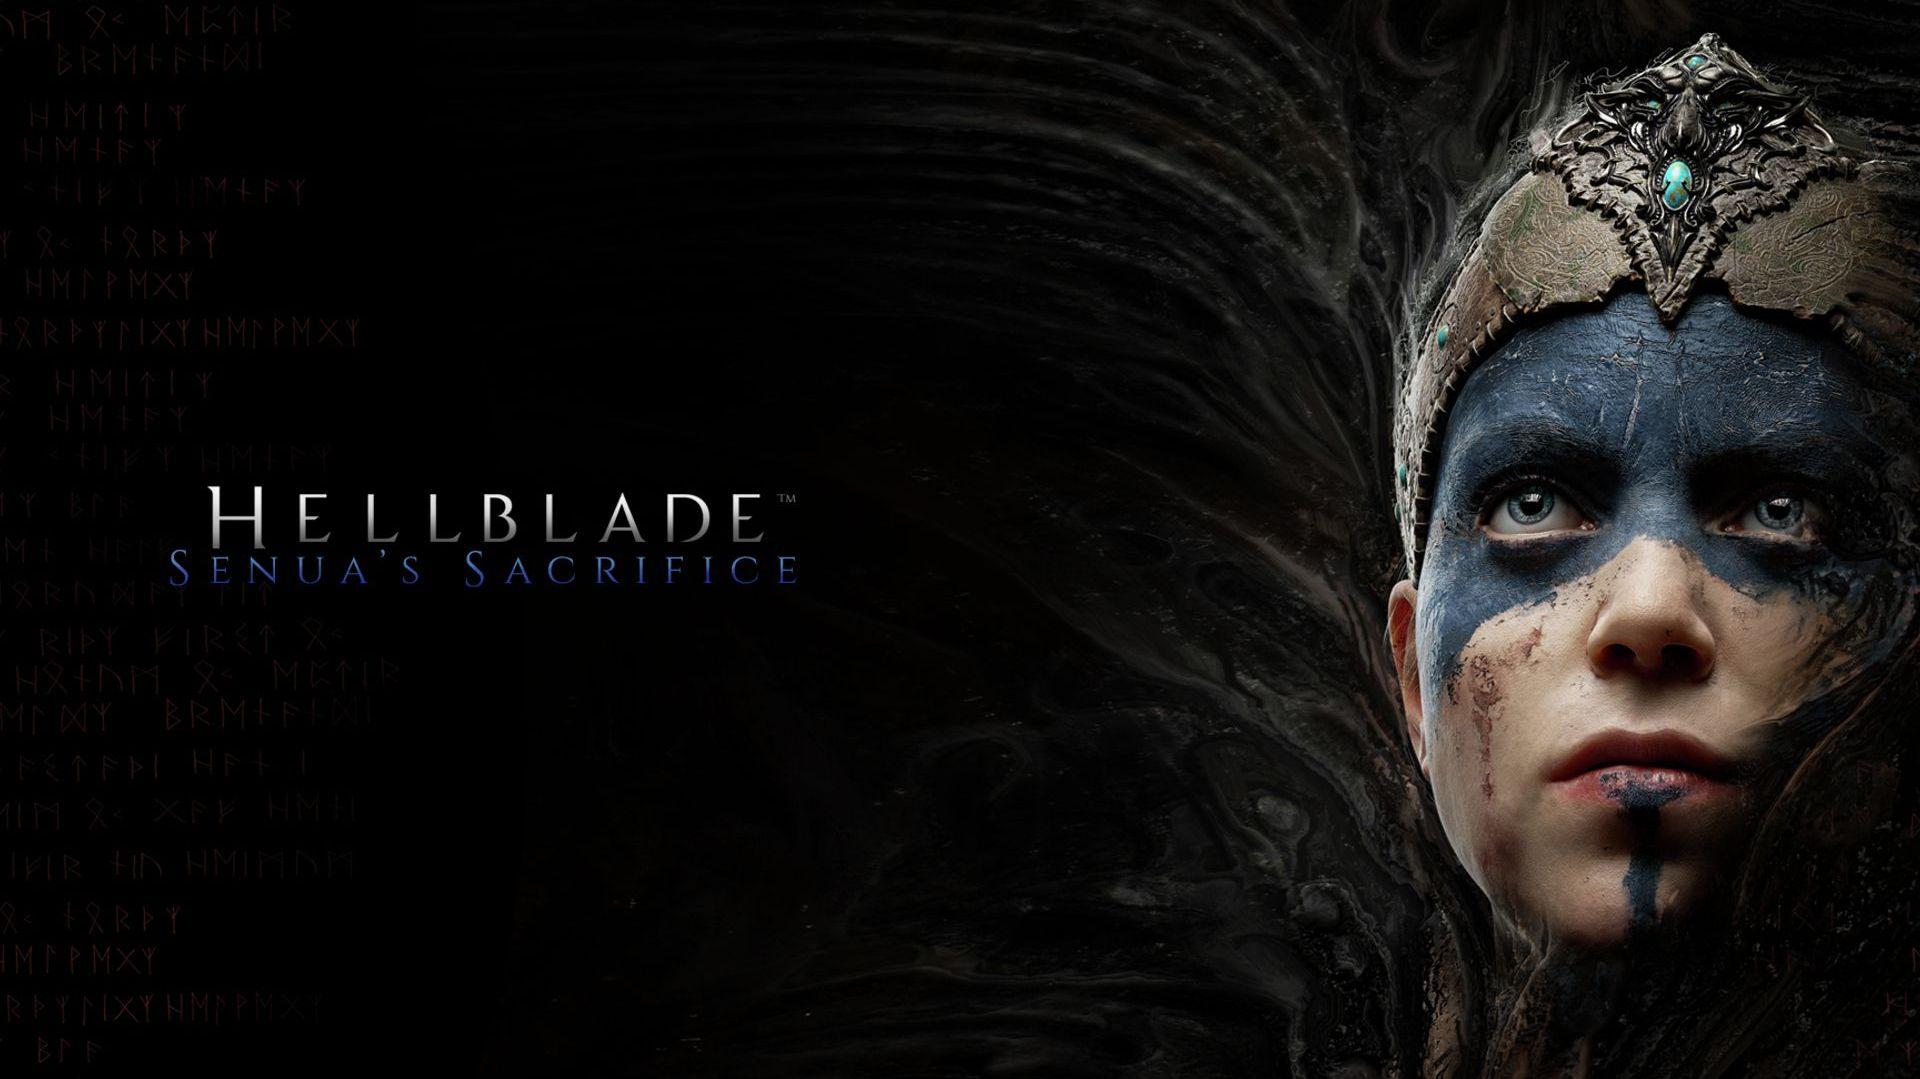 Hellblade и GRID (2019) за подписку Humble Choice (и не только)